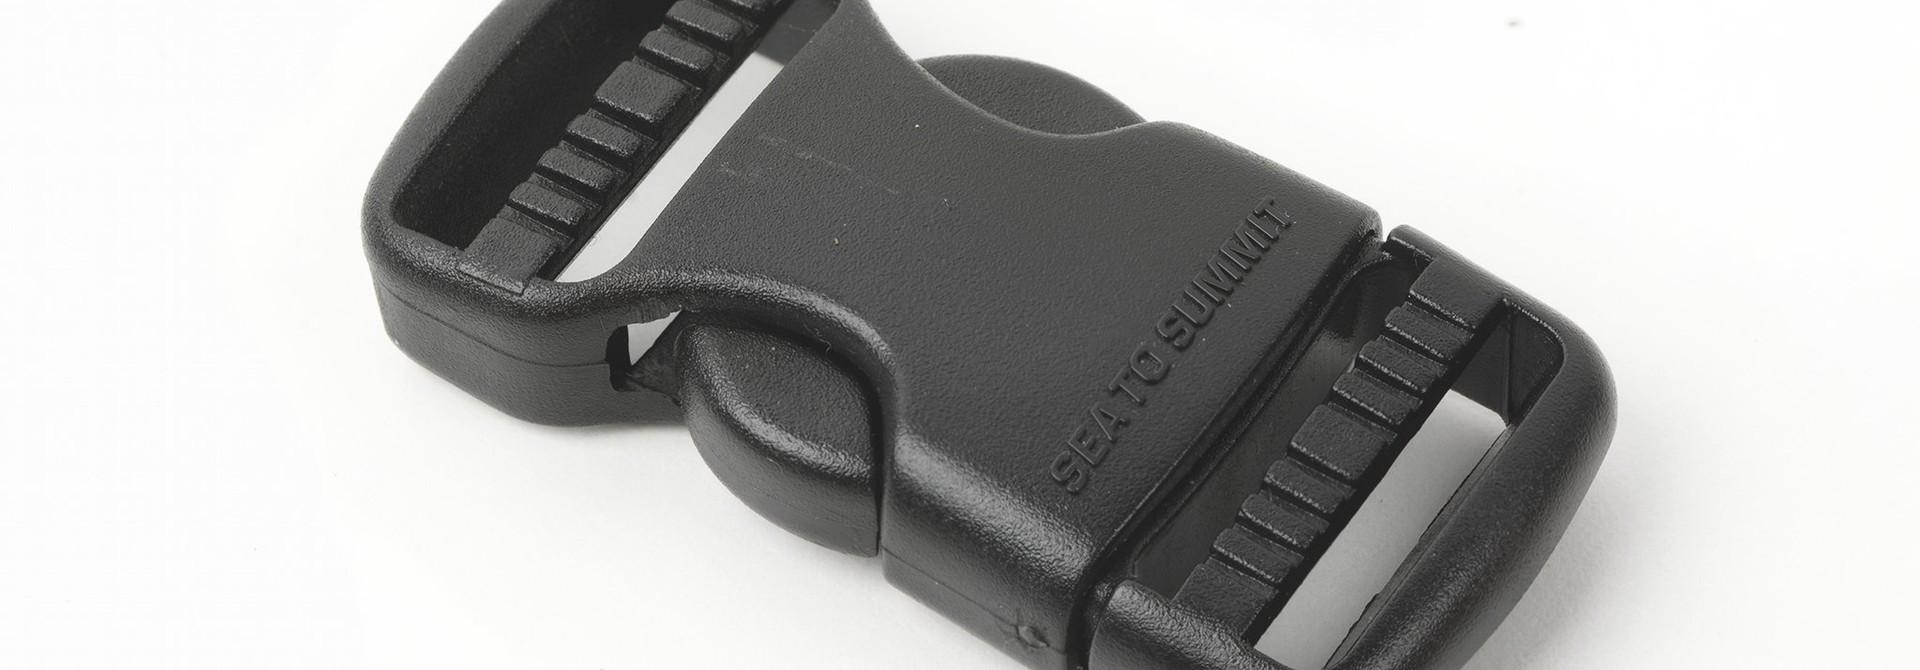 "Field Repair Buckle 25mm / 1"" Side Release, 2 Ladderlock"